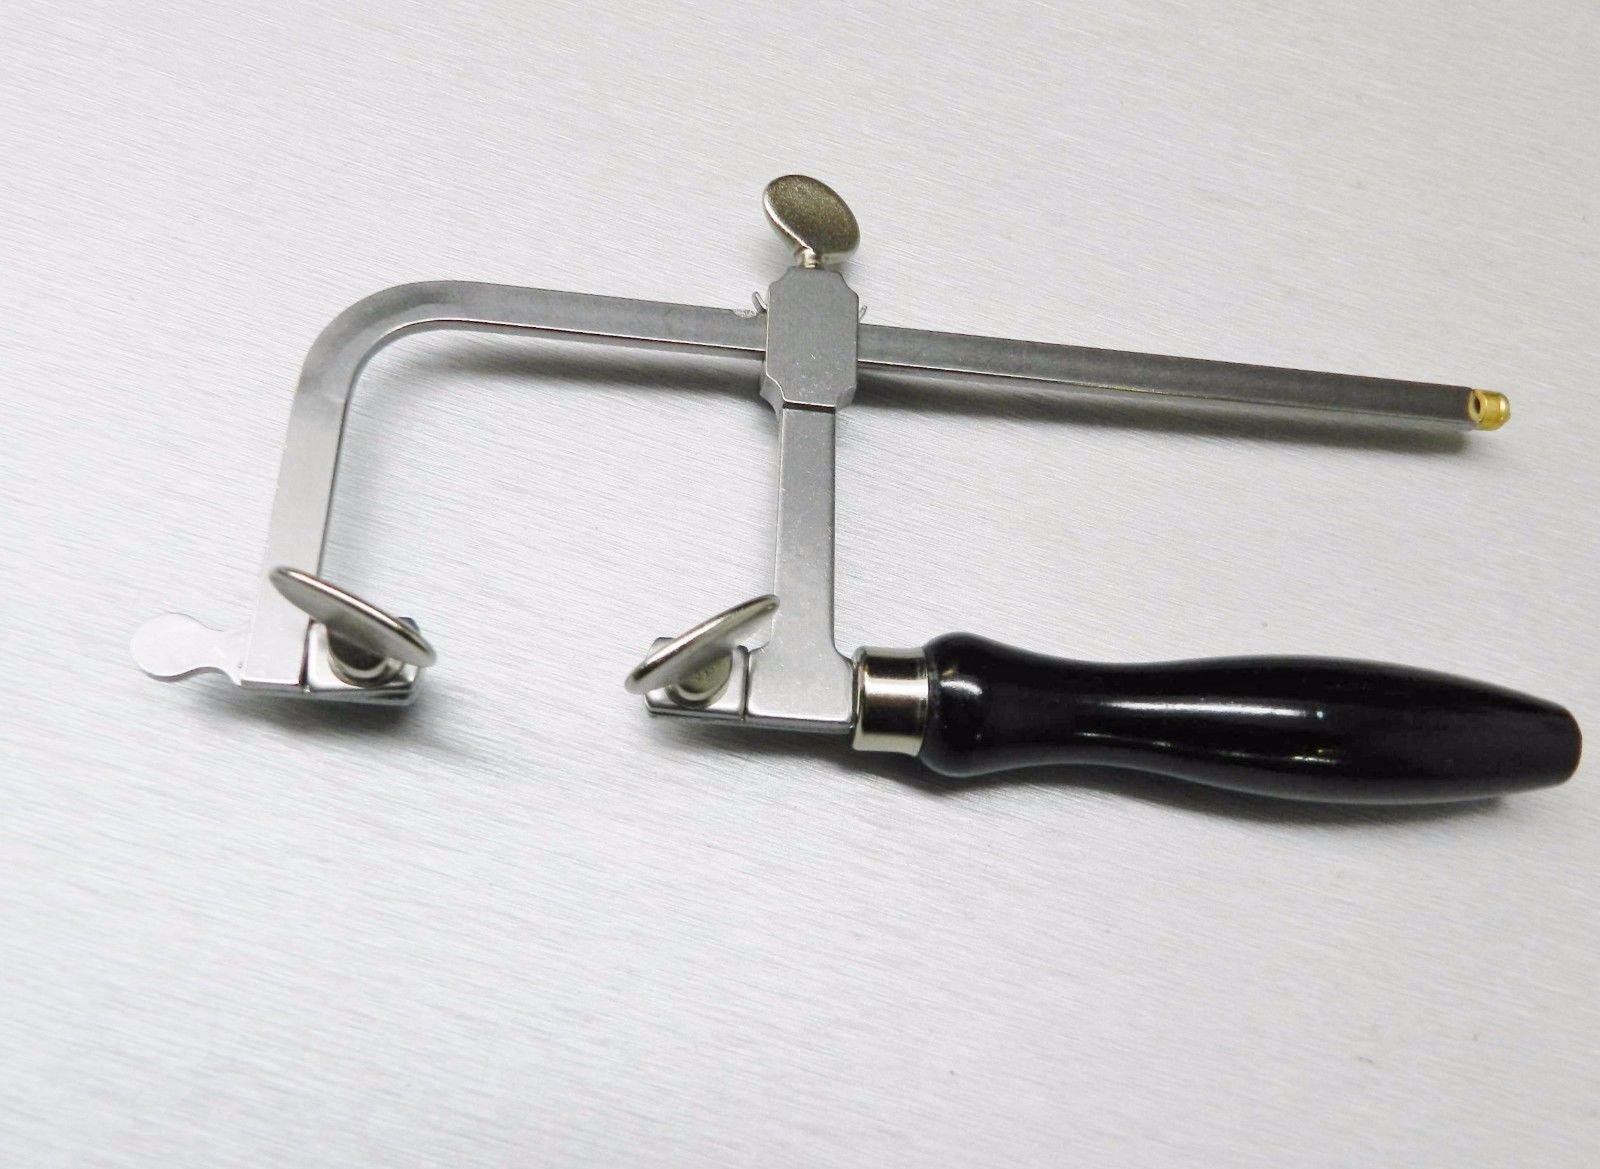 SAW FRAME 2-1/4'' 60mm SAWFRAME FOR JEWELERS SAW BLADES JEWELRY MAKING HAND TOOLS (E6) by Novel (Image #6)